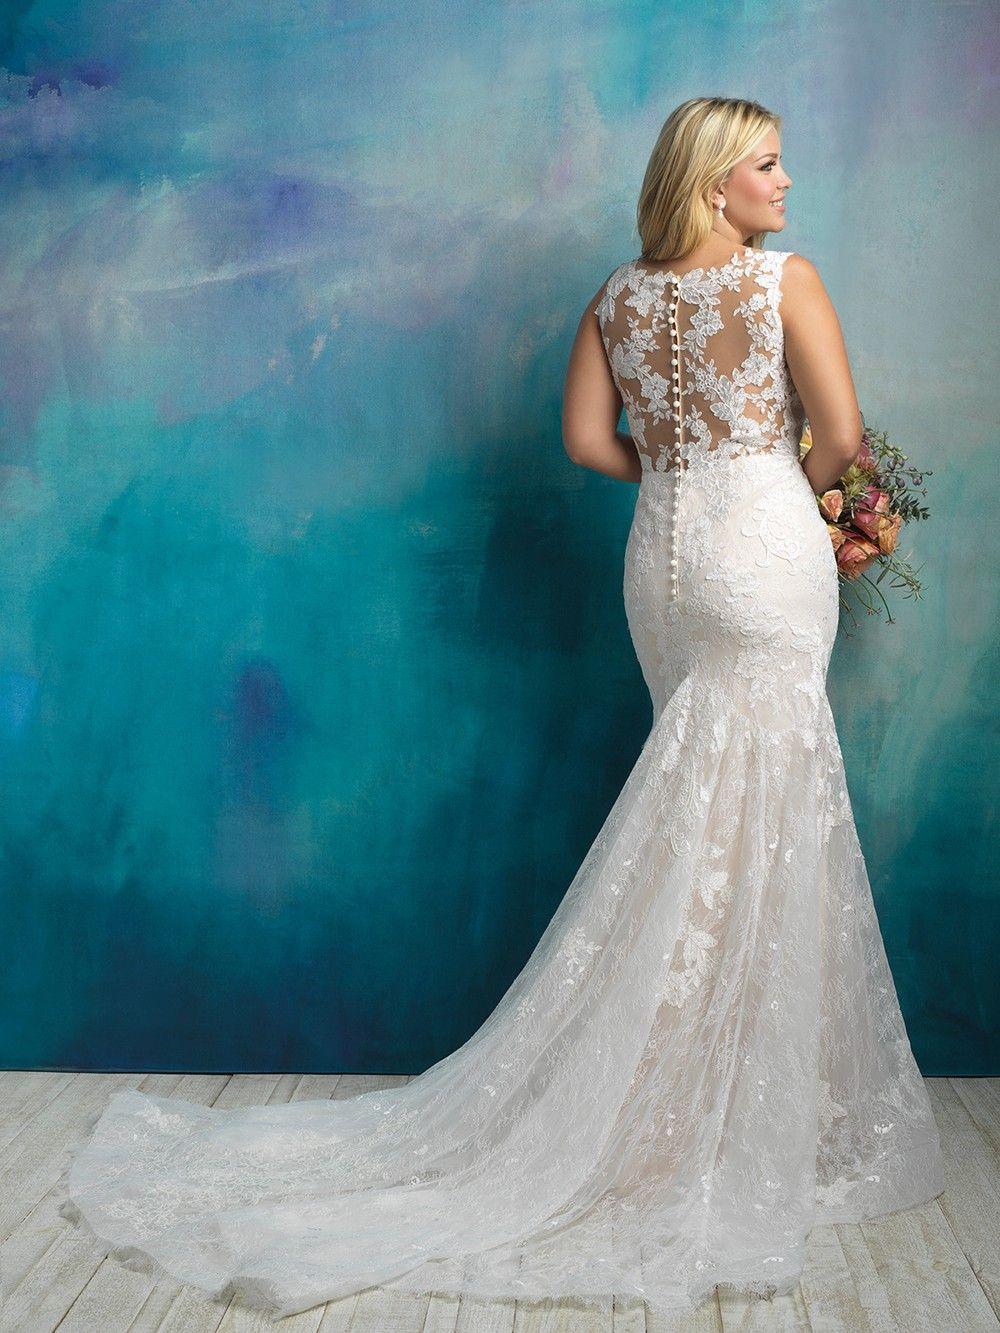 Allure Bridals - Dress Style W418. #weddingdresses #wedding #bride ...